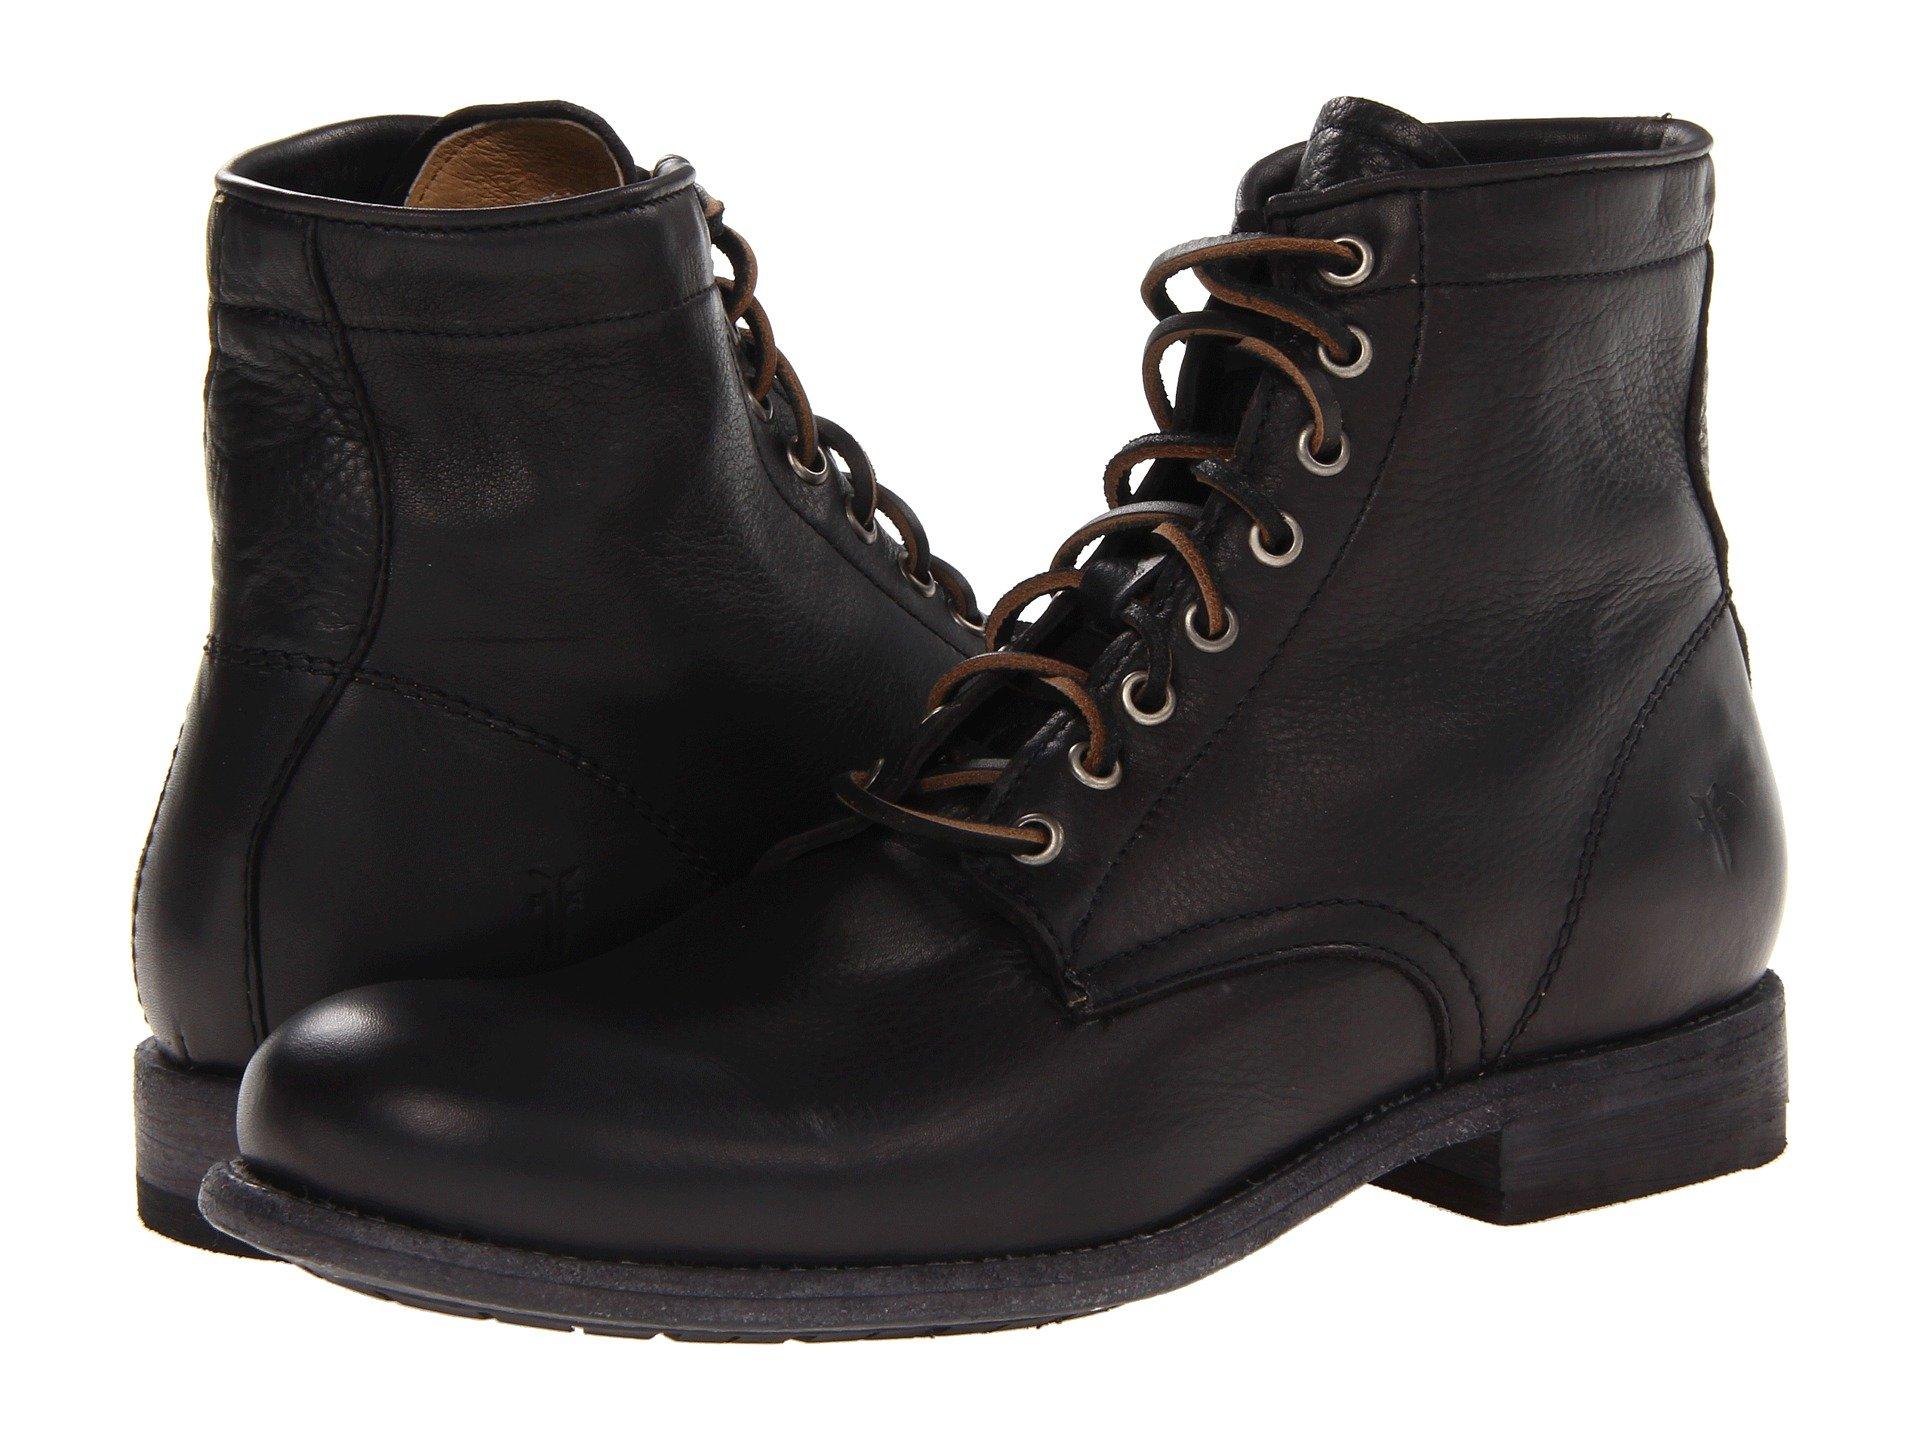 023a29ac27e Men s Distressed Black Shoes + FREE SHIPPING